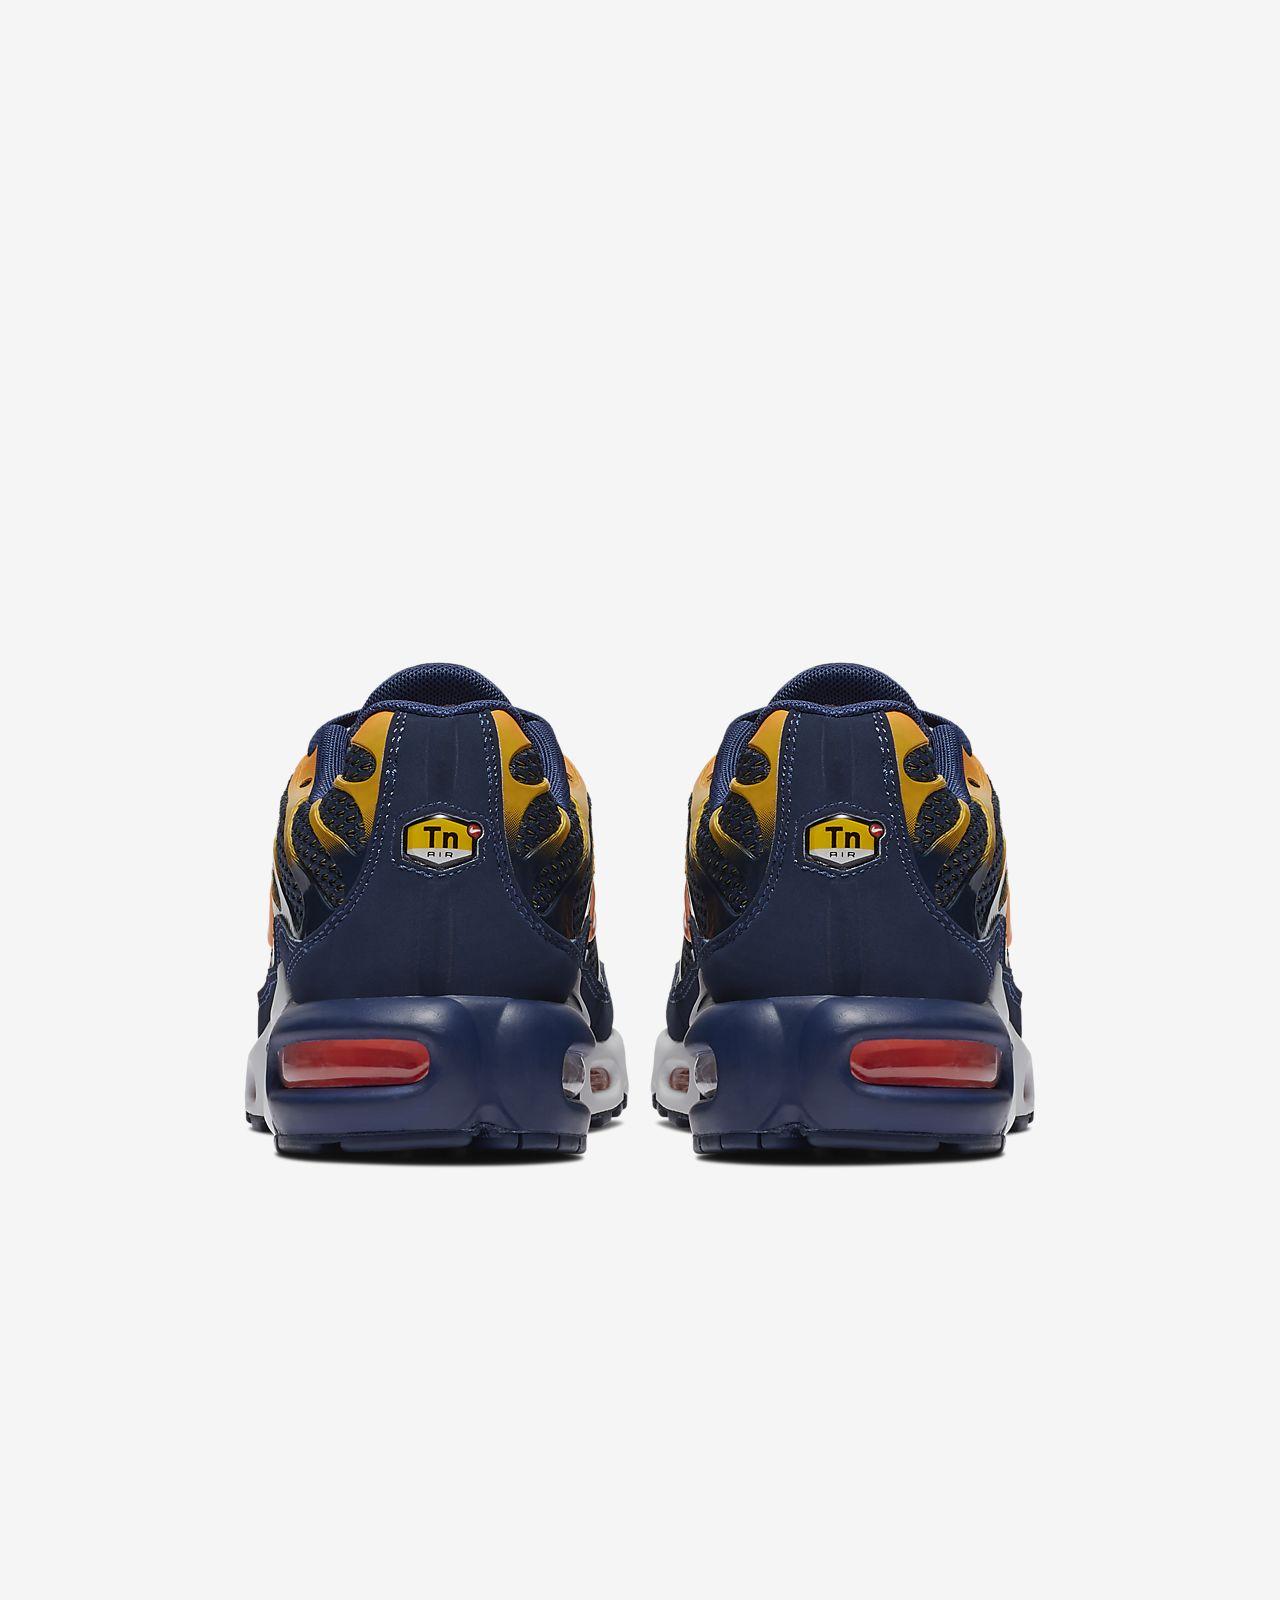 fb67dc263a80ae Nike Air Max Plus Men s Shoe. Nike.com PT